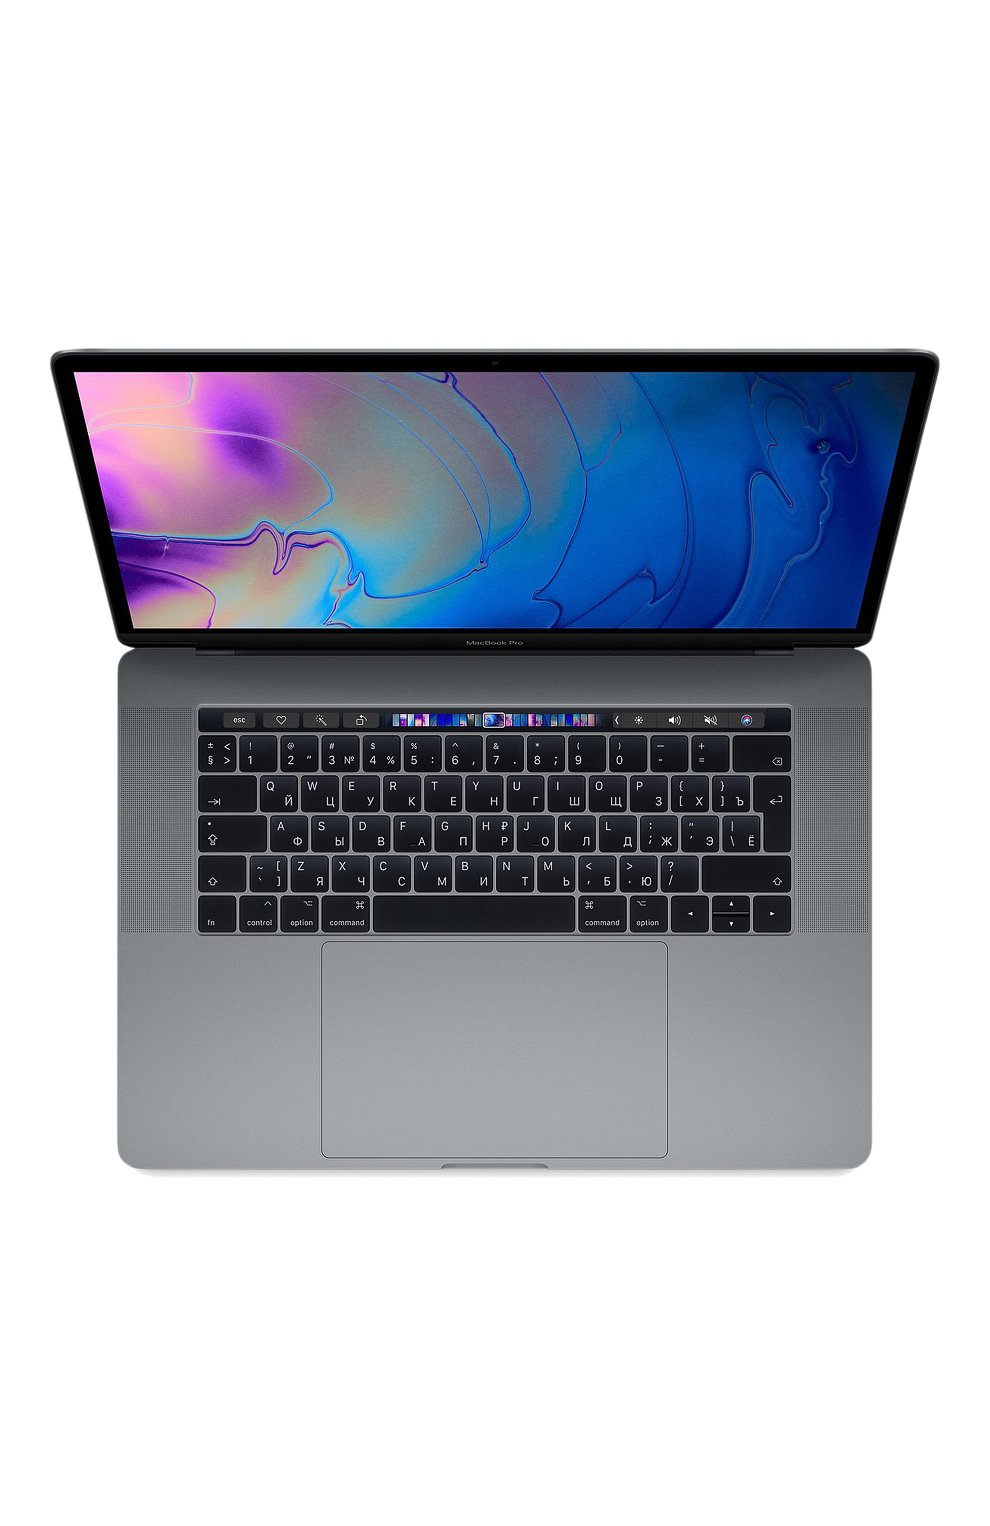 "MacBook Pro 15"" с панелью Touch Bar со встроенным датчиком Touch ID 6-Core i7 2.6GHz 512GB Space Gray | Фото №1"